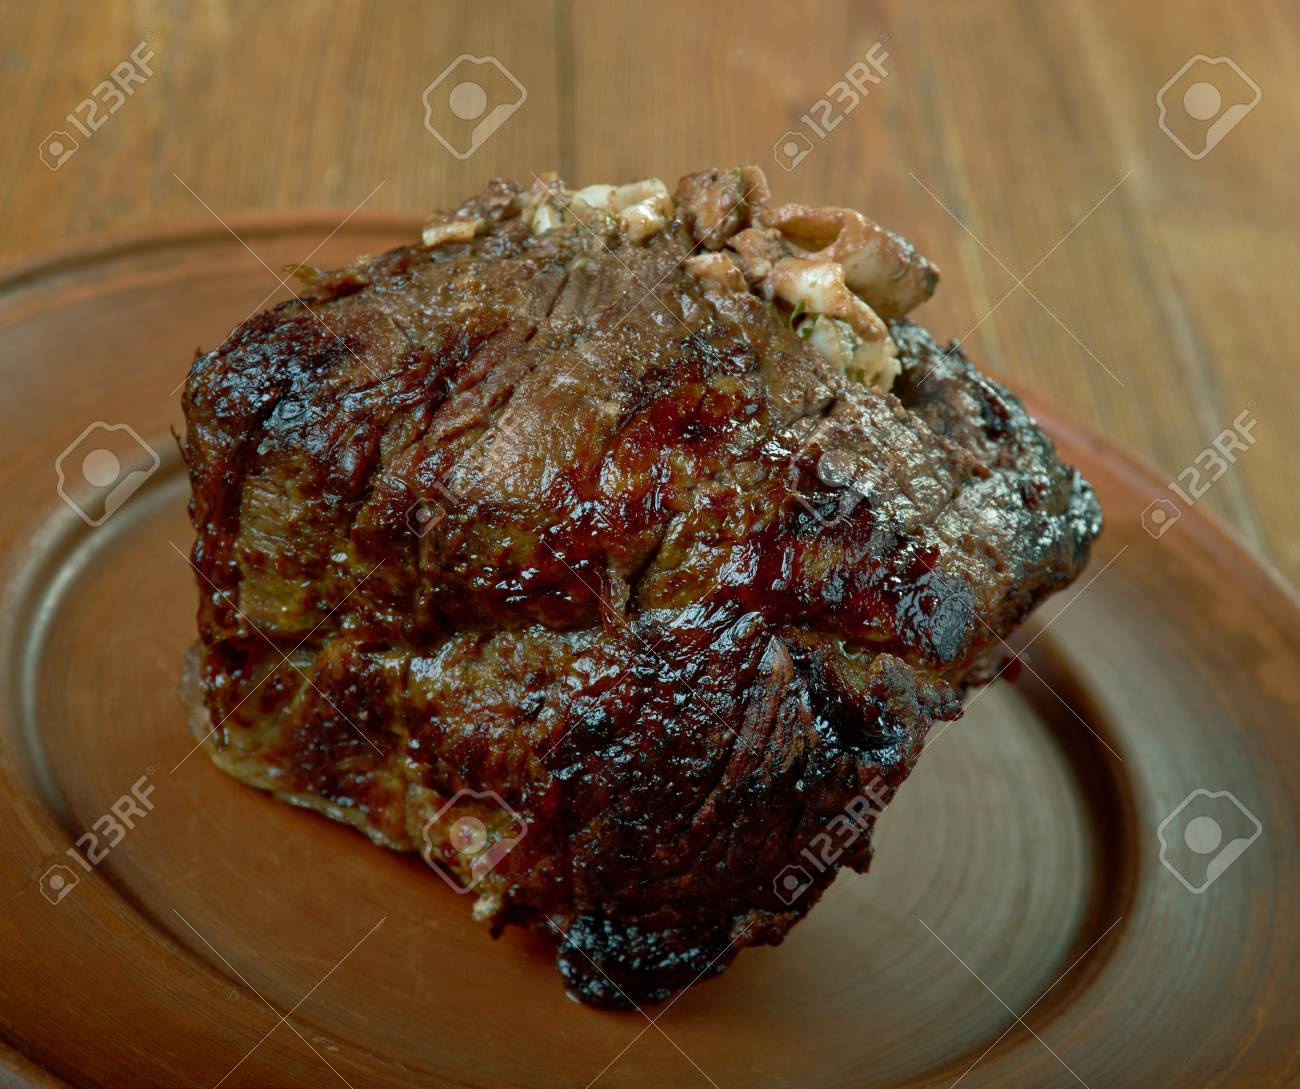 Carpet Bag Steak Australian or American derivation, popular in Australia and New Zealand, classic